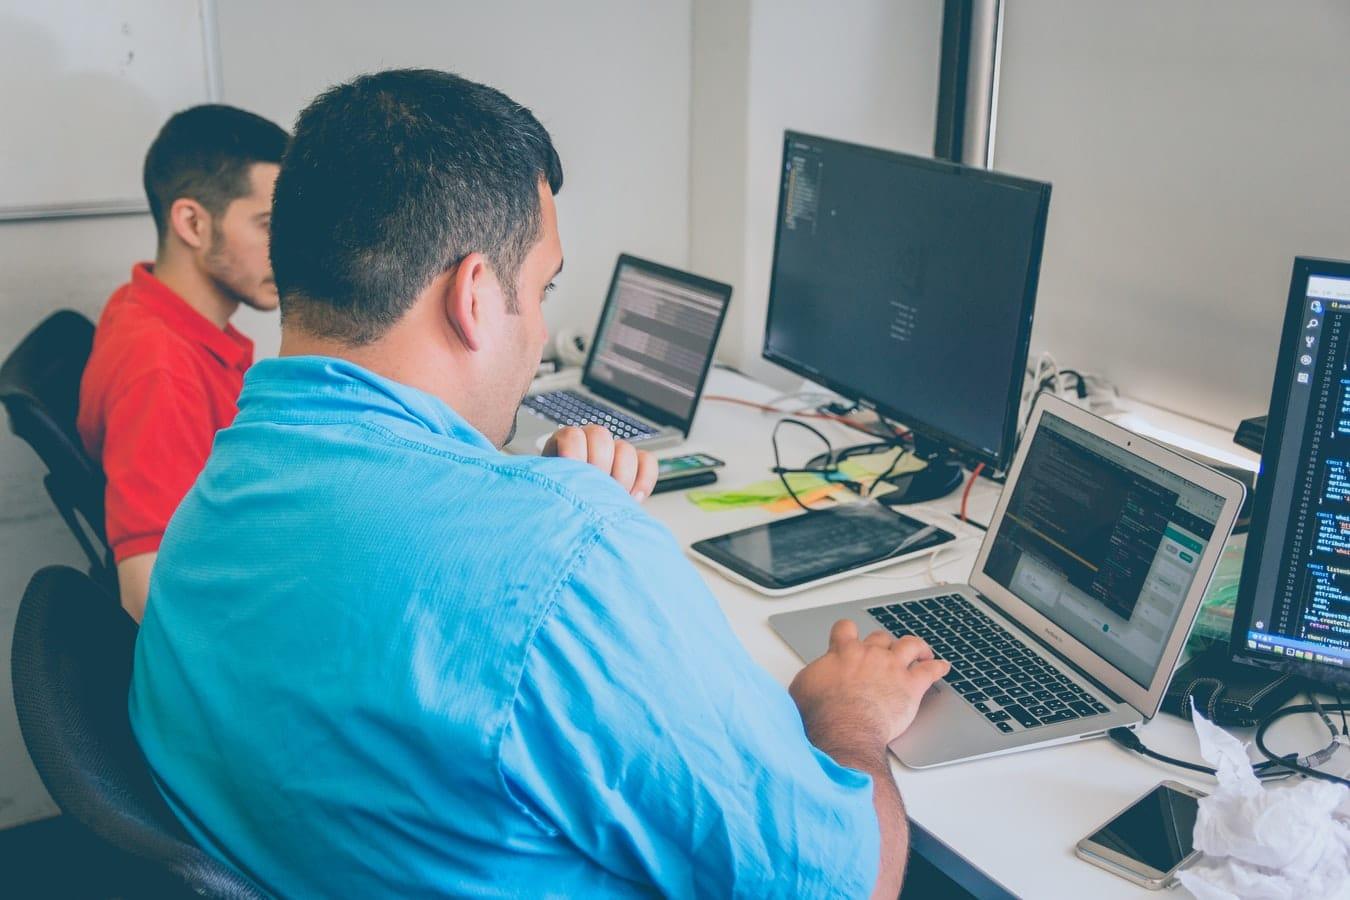 guys-working-on-laptops